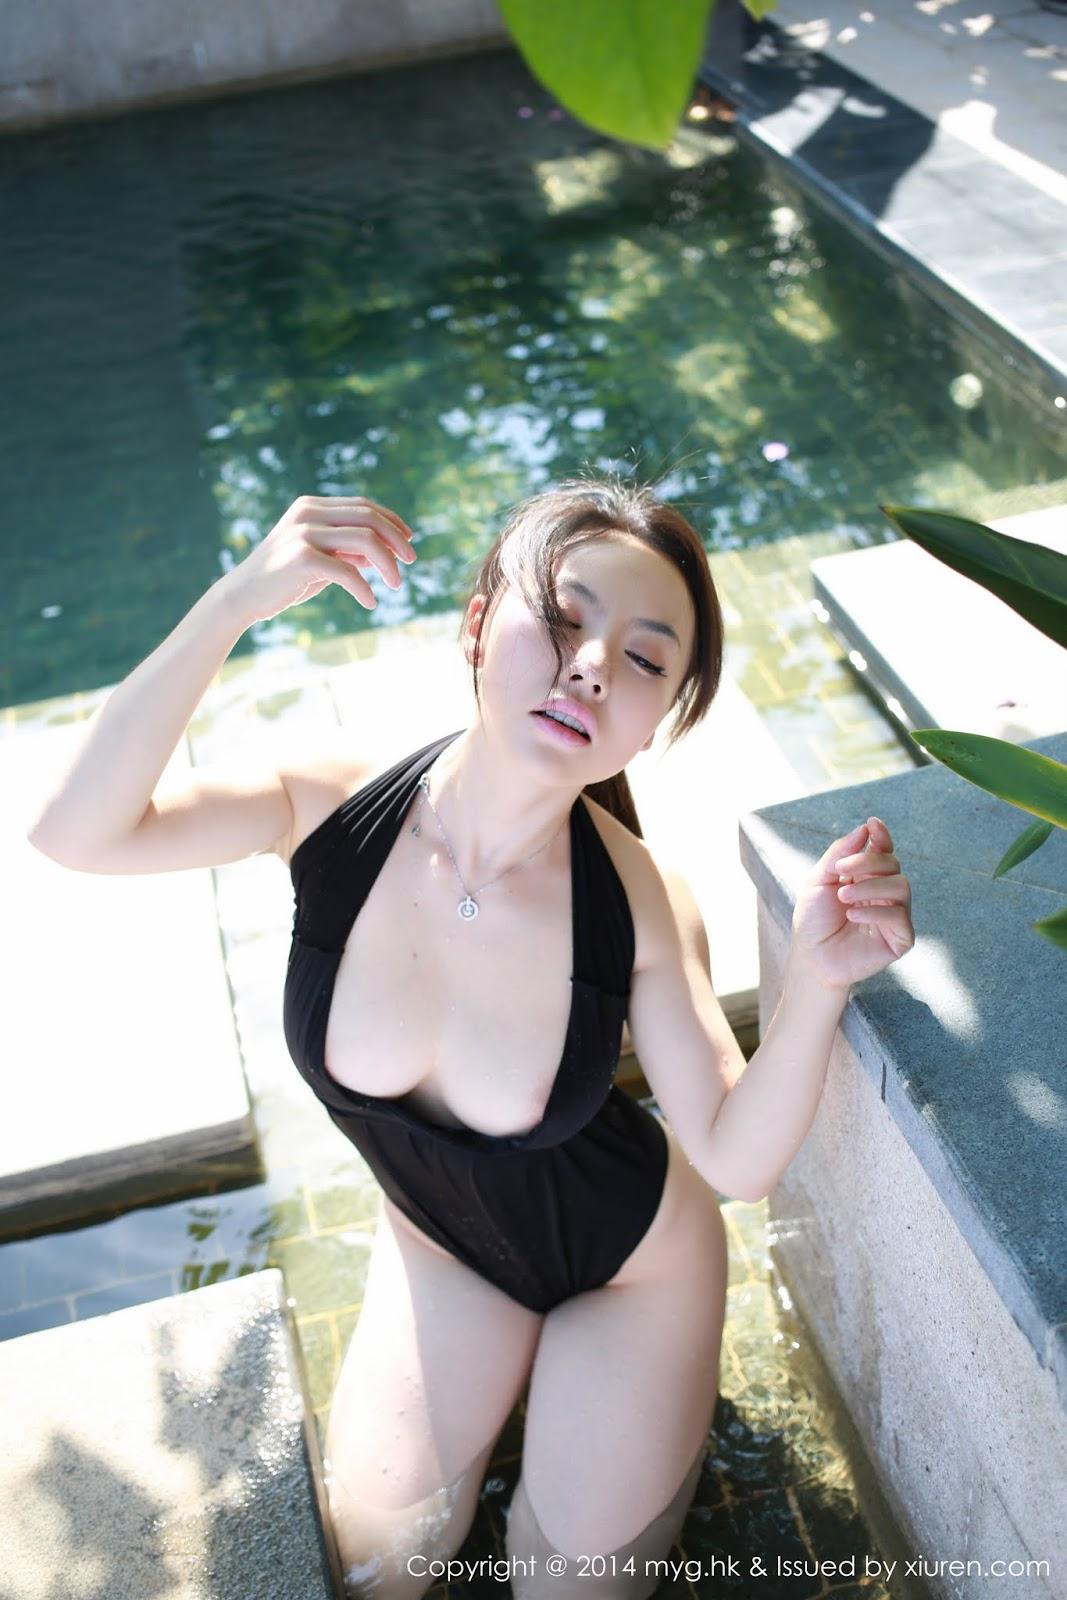 40038 101 - MYGIRL VOL.30 Photo Nude Hot Sexy